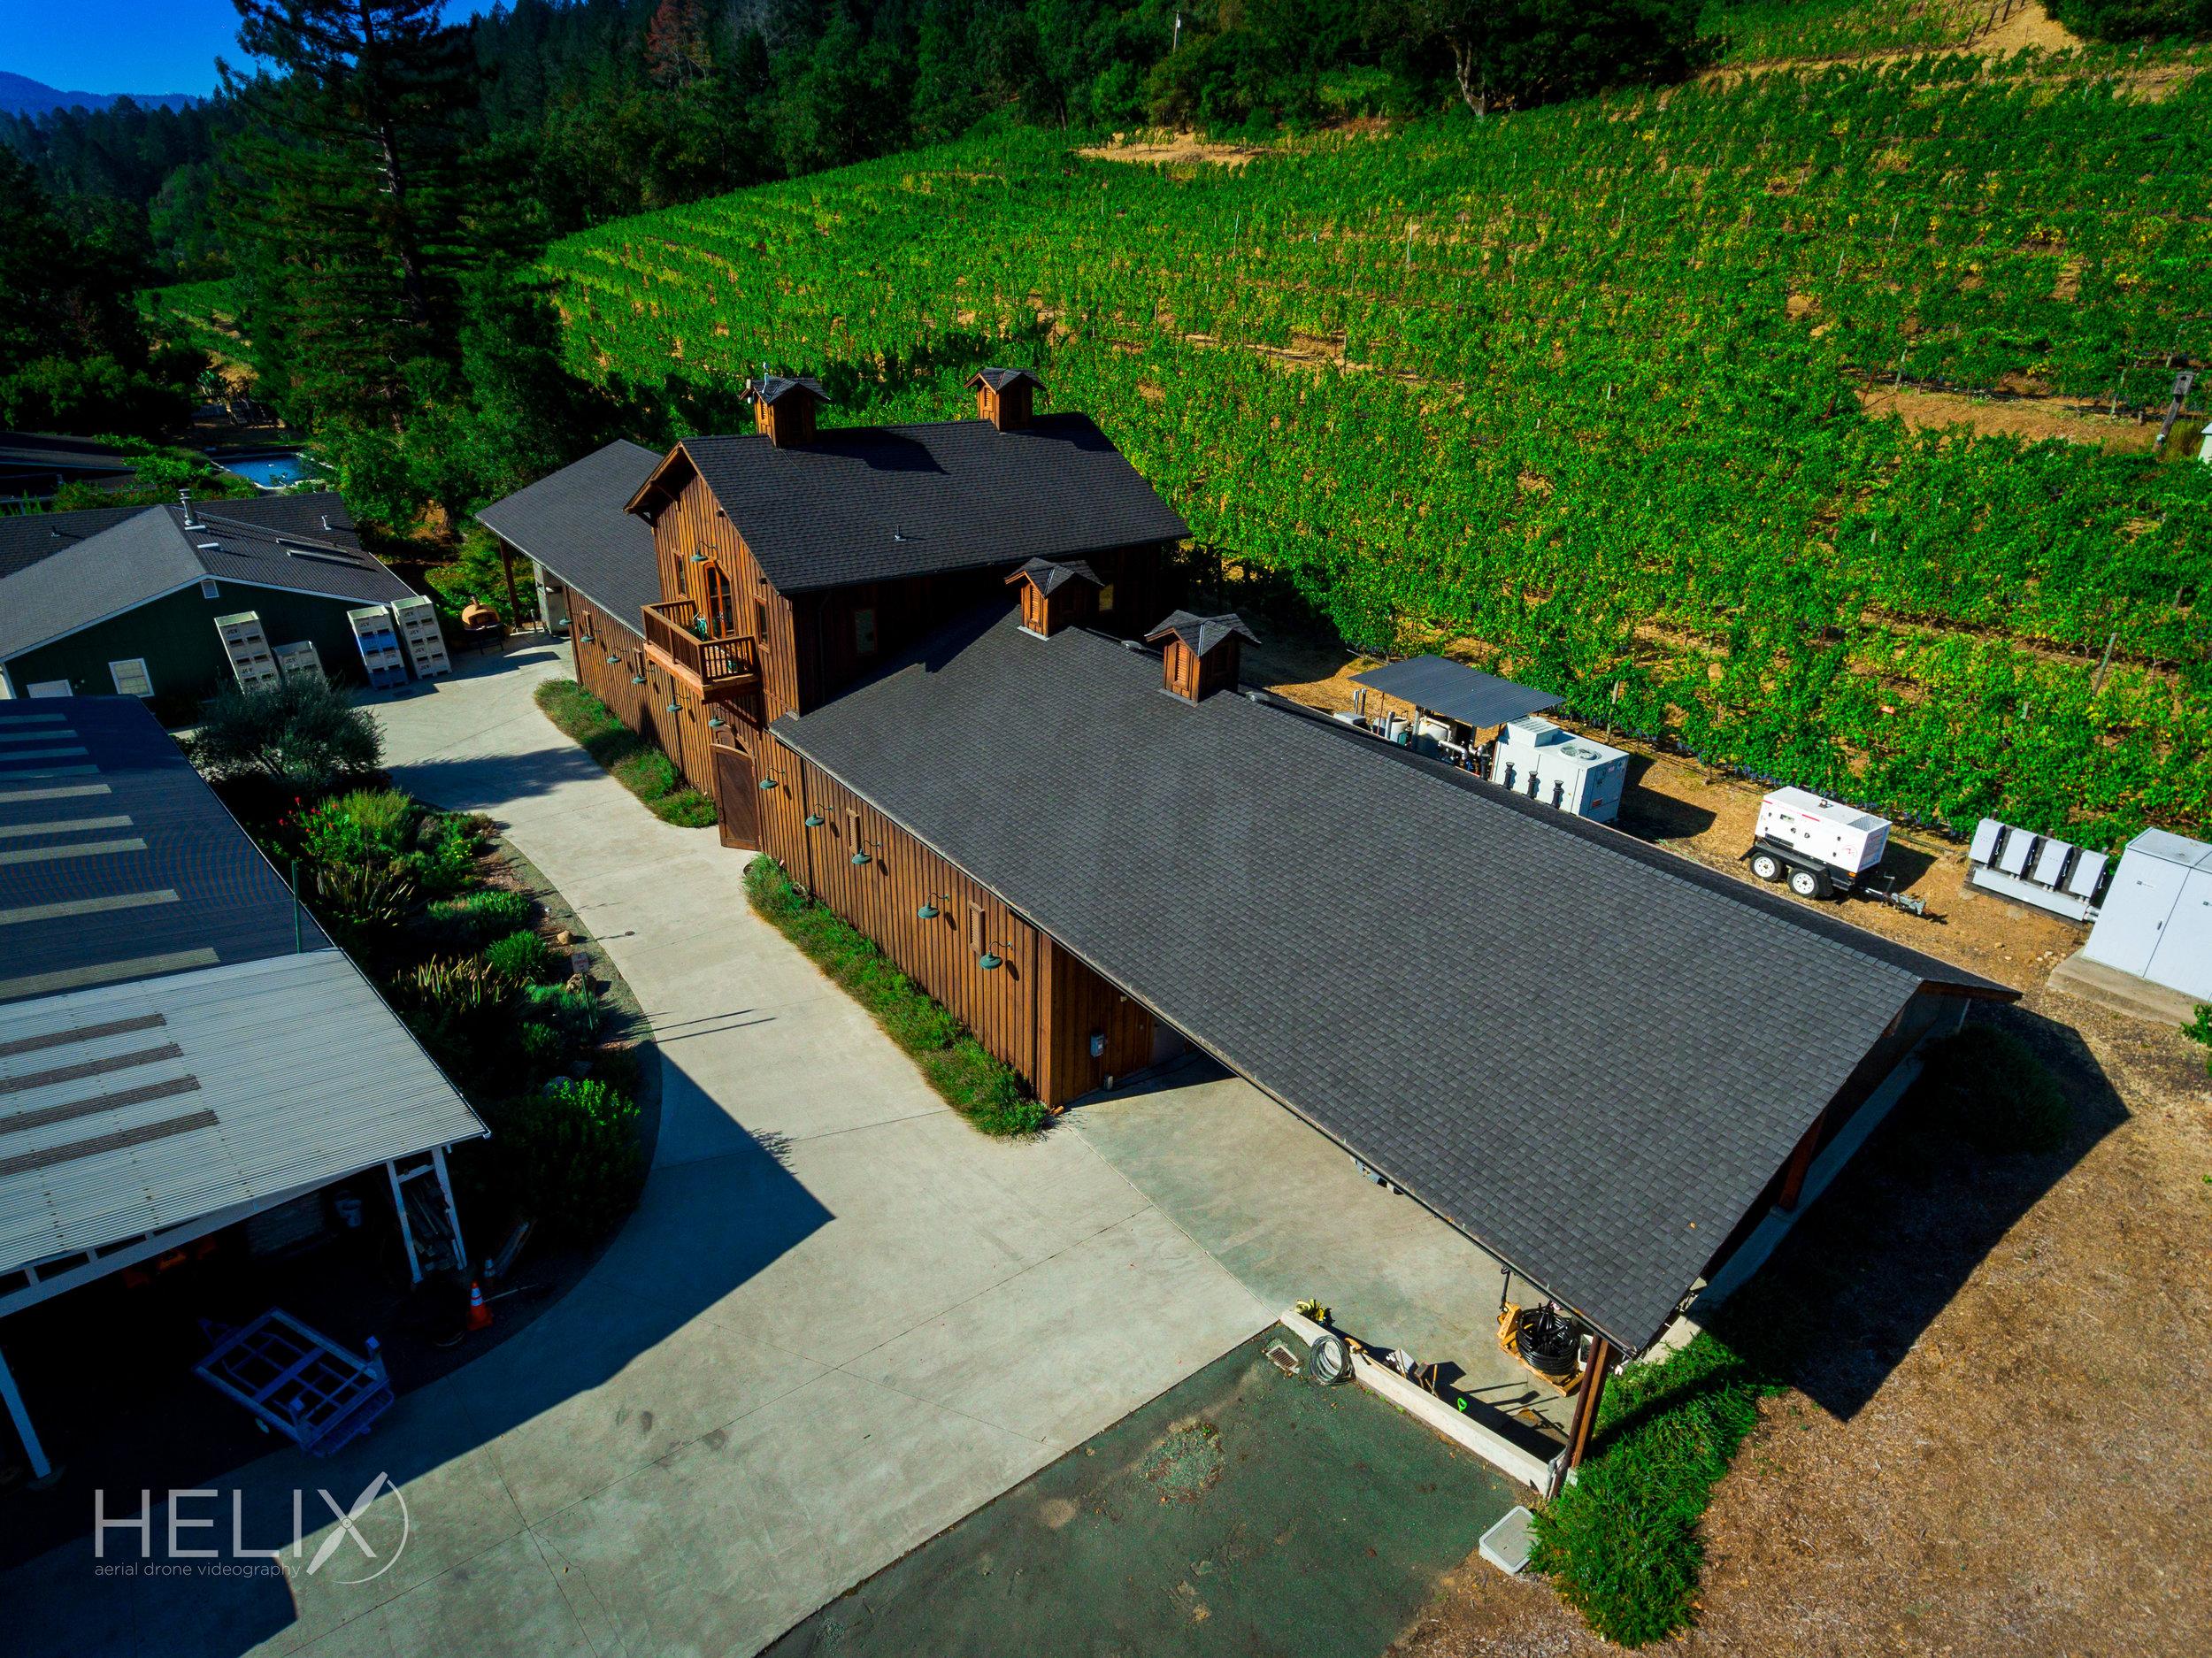 Jerico Canyon Vineyards